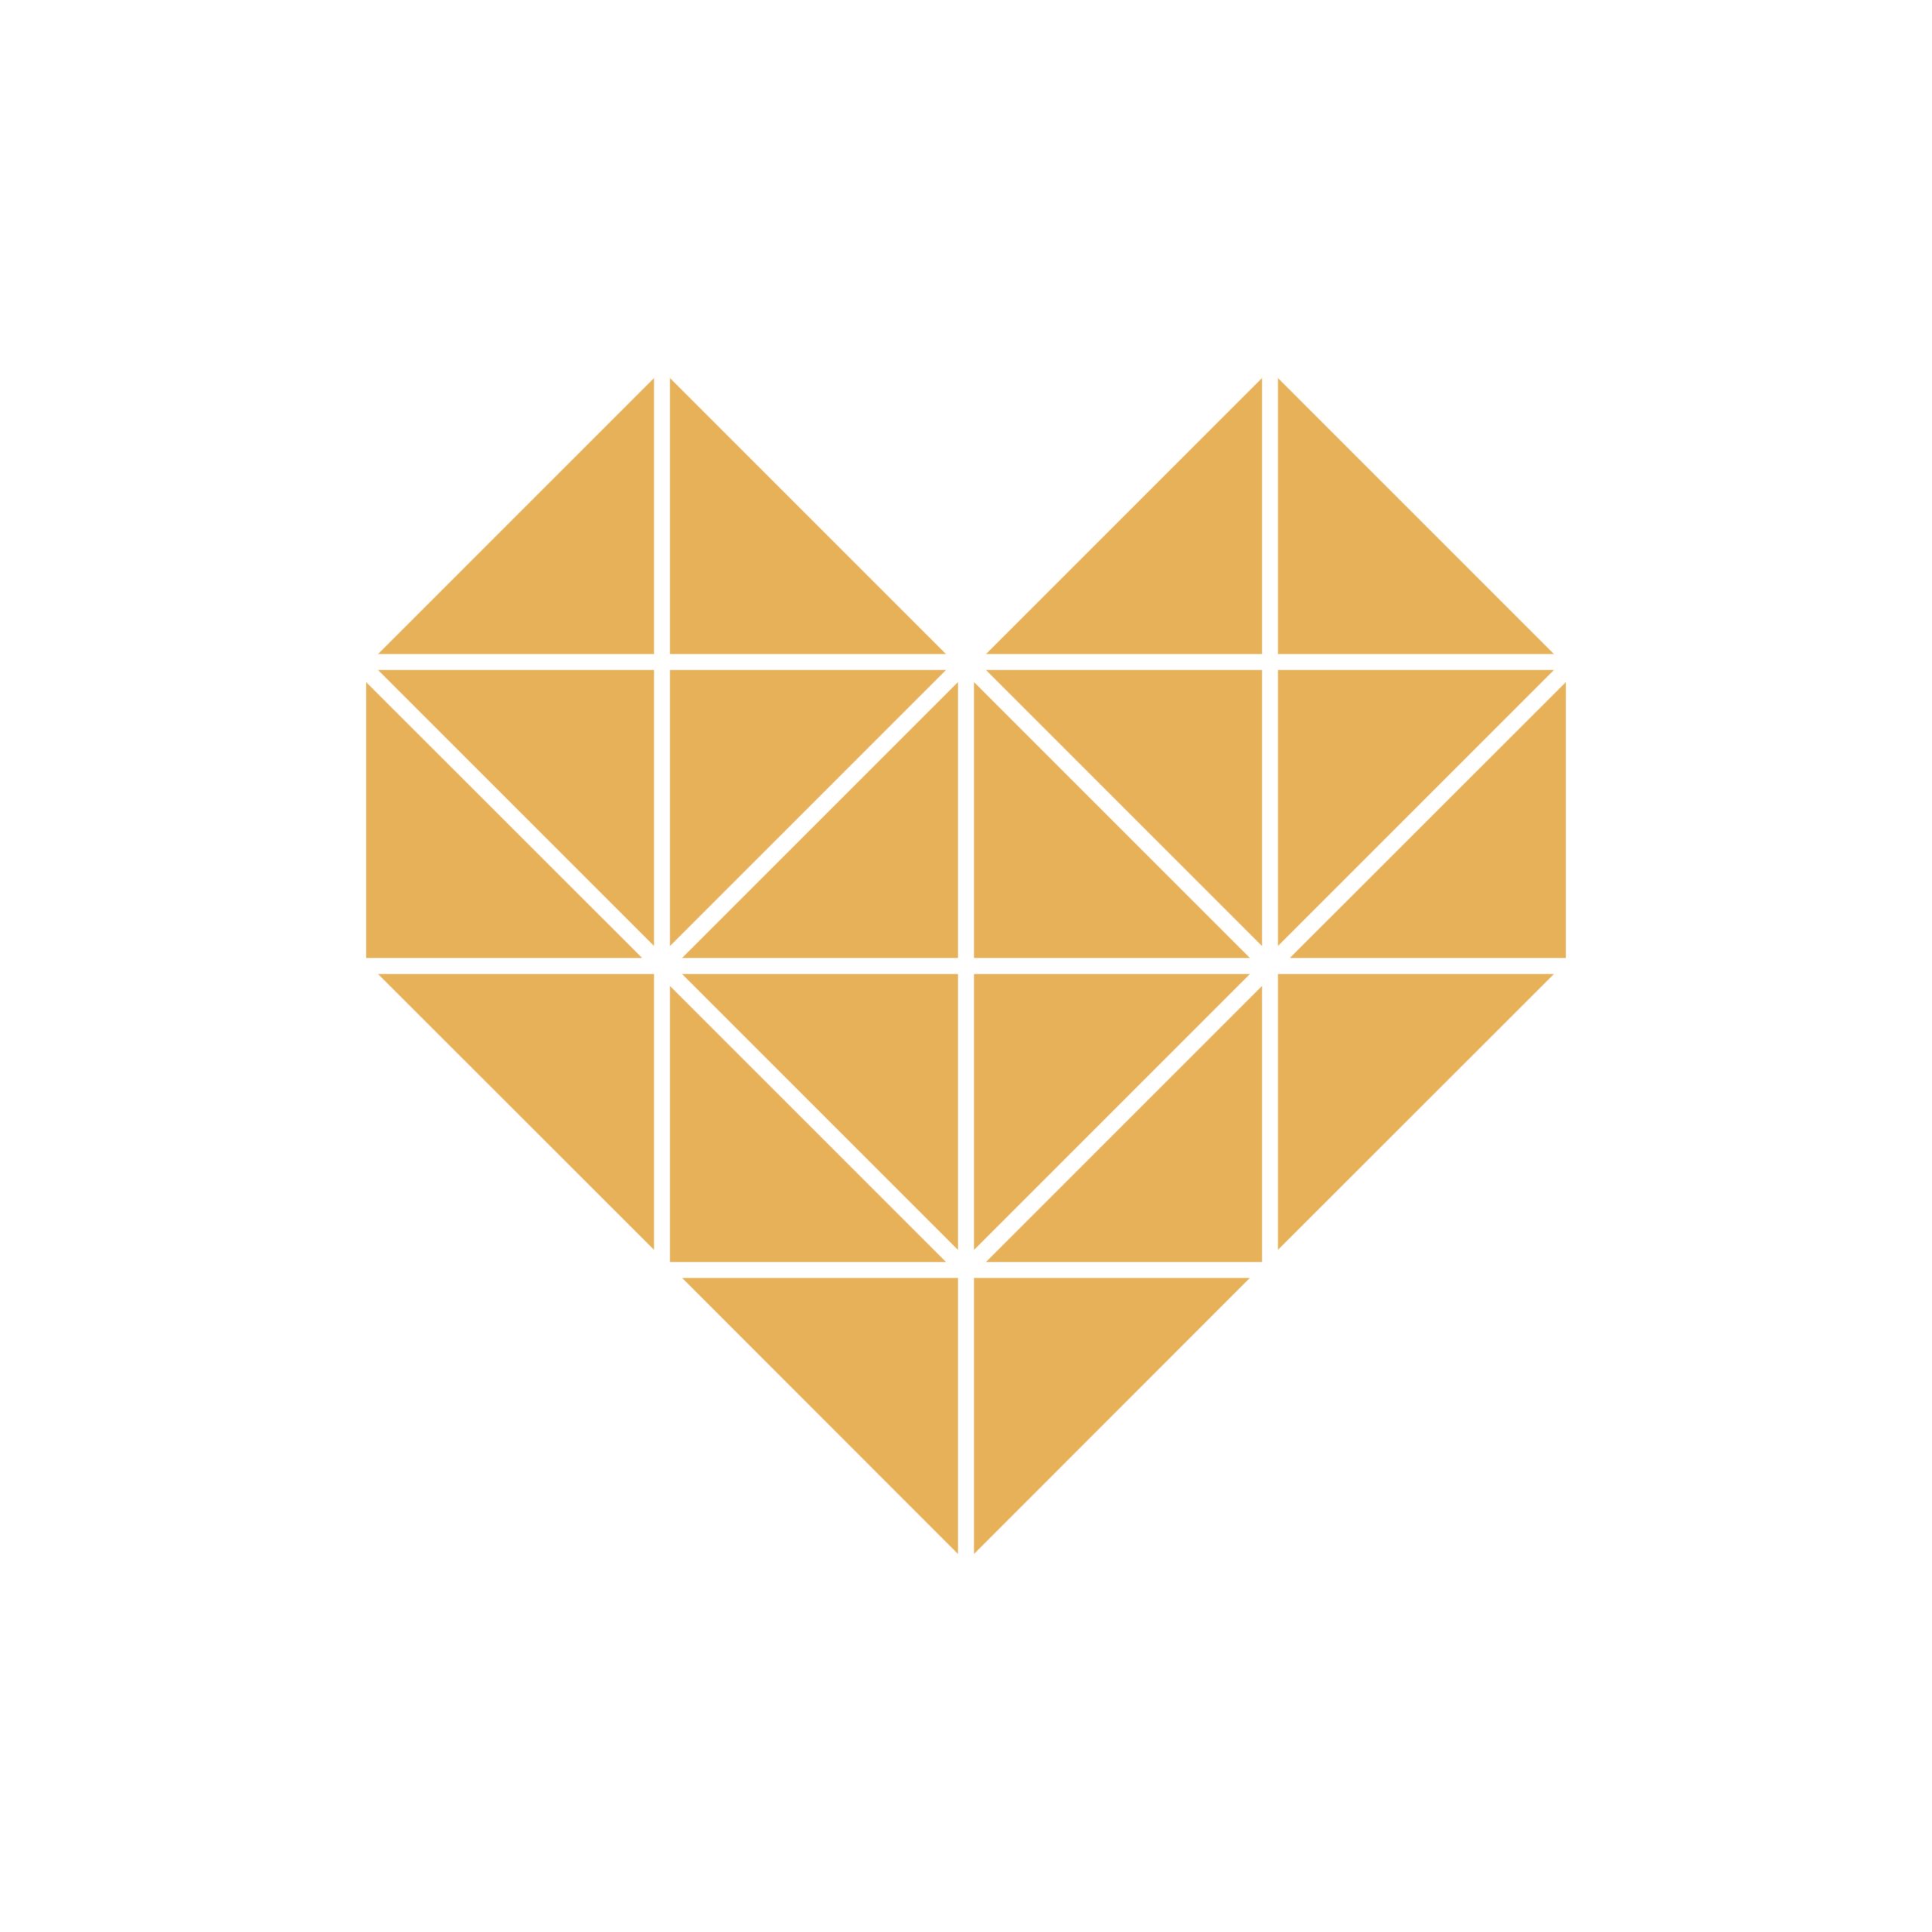 noun_Heart made of triangles_350284 (1)